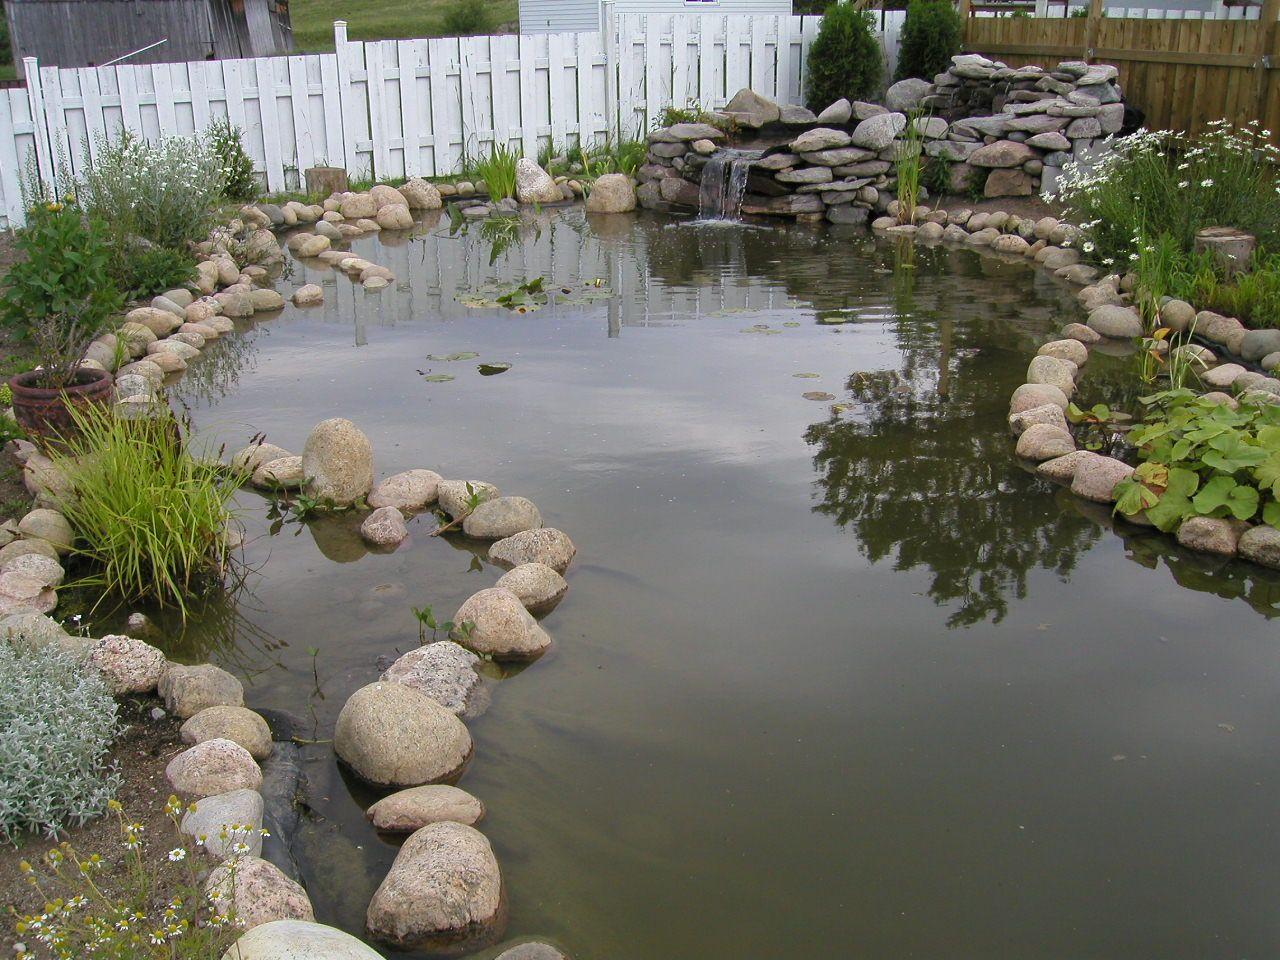 20+ Grand bassin de jardin ideas in 2021